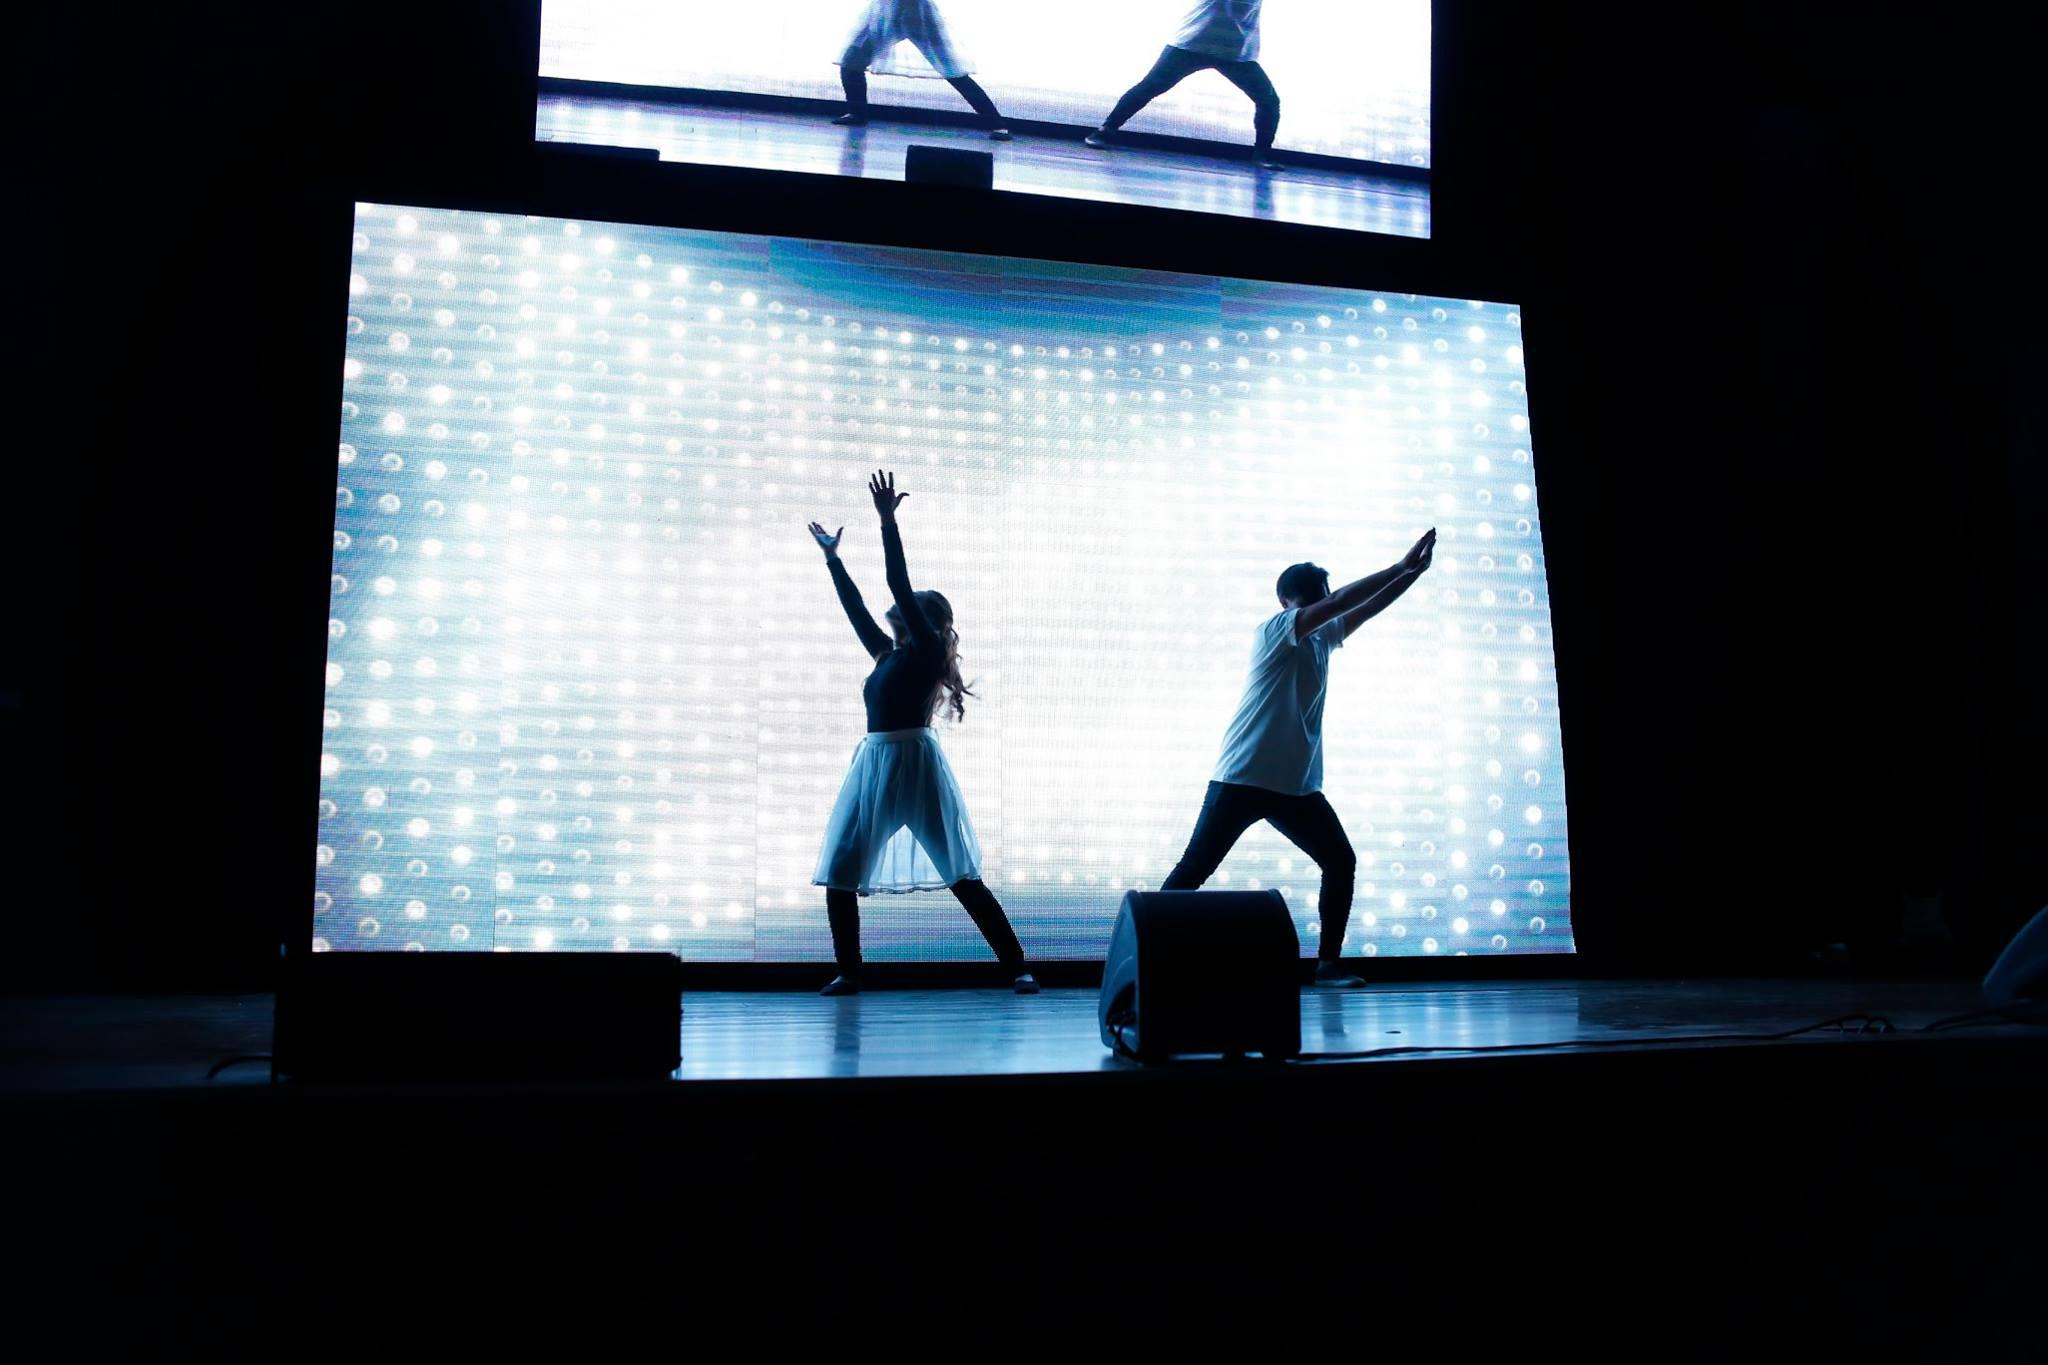 PANTALLAS DE LED Nexos pantallas de LED Indoor